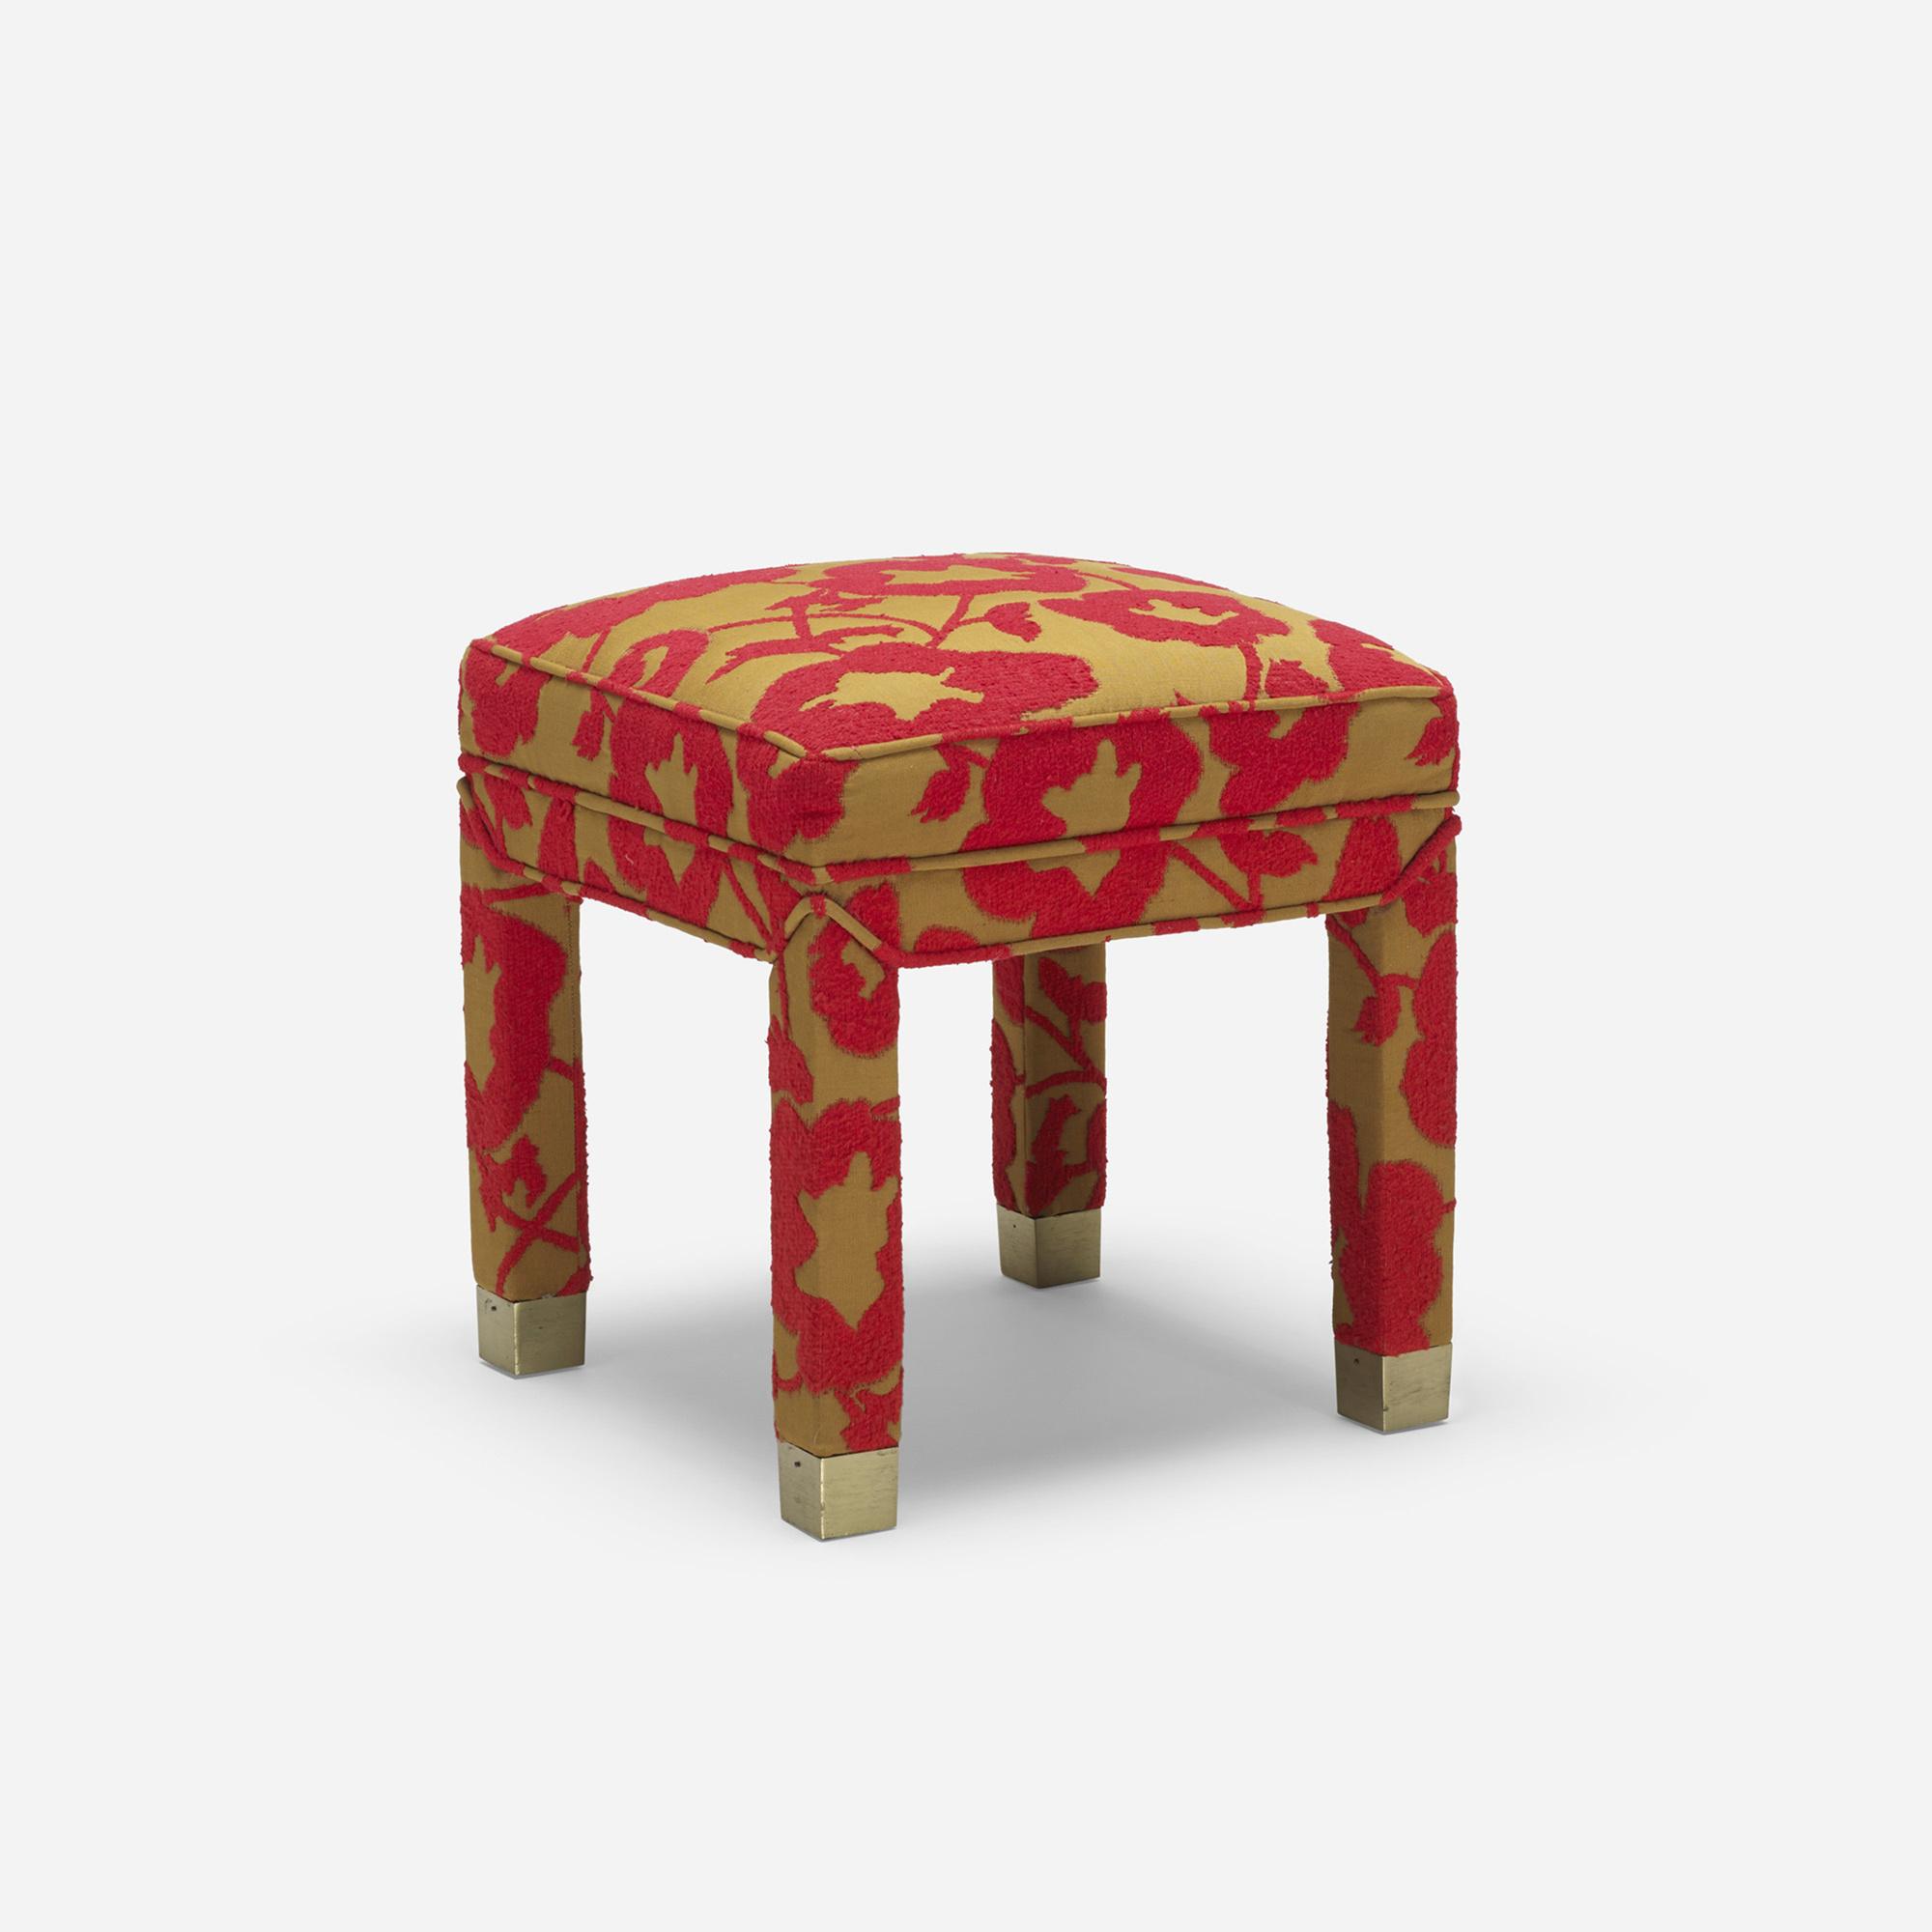 213: American / stool (1 of 4)